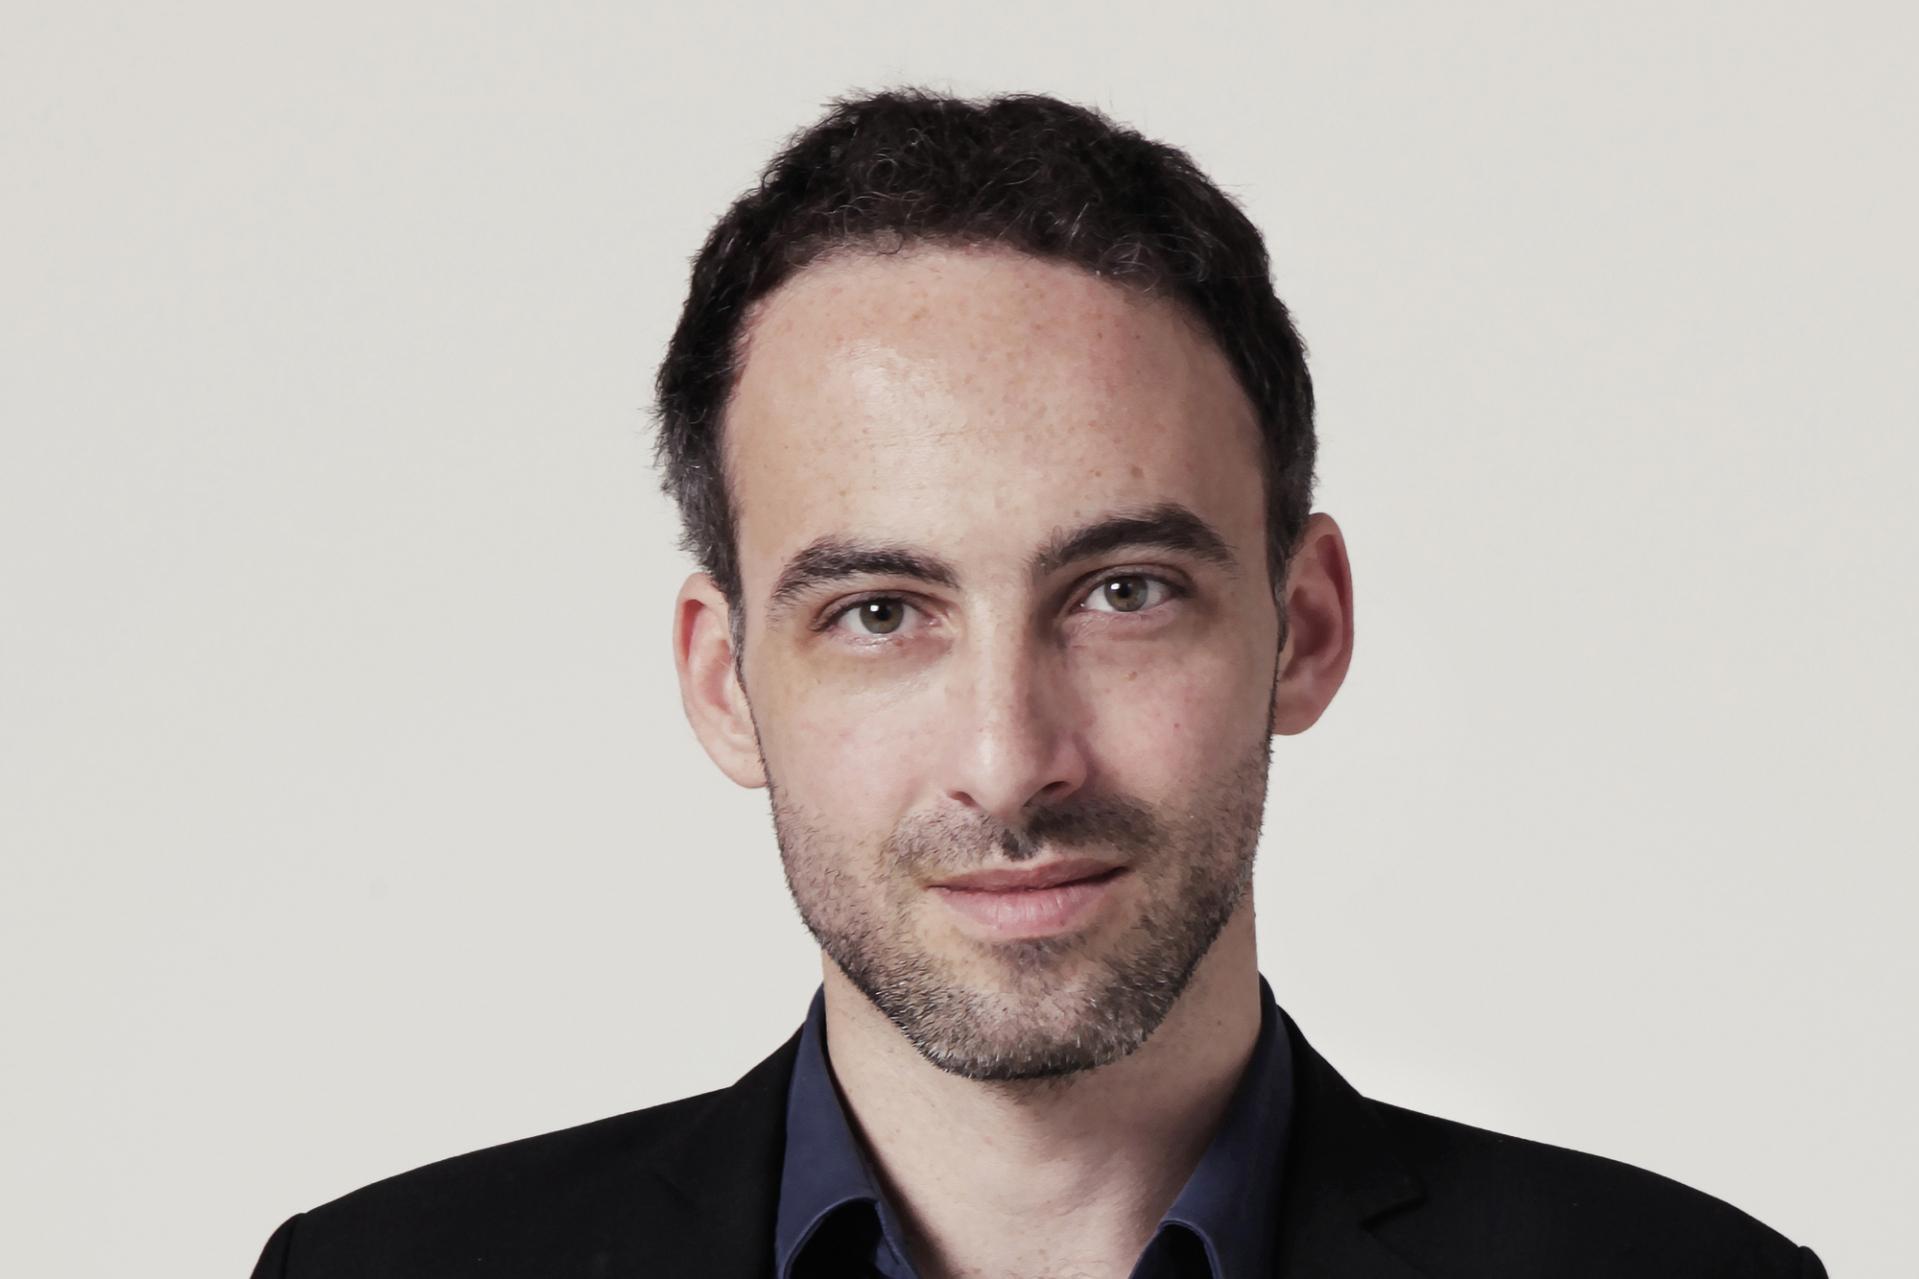 Raphaël Glucksmann News: Raphaël Glucksmann Au Grand Débat De Vichy